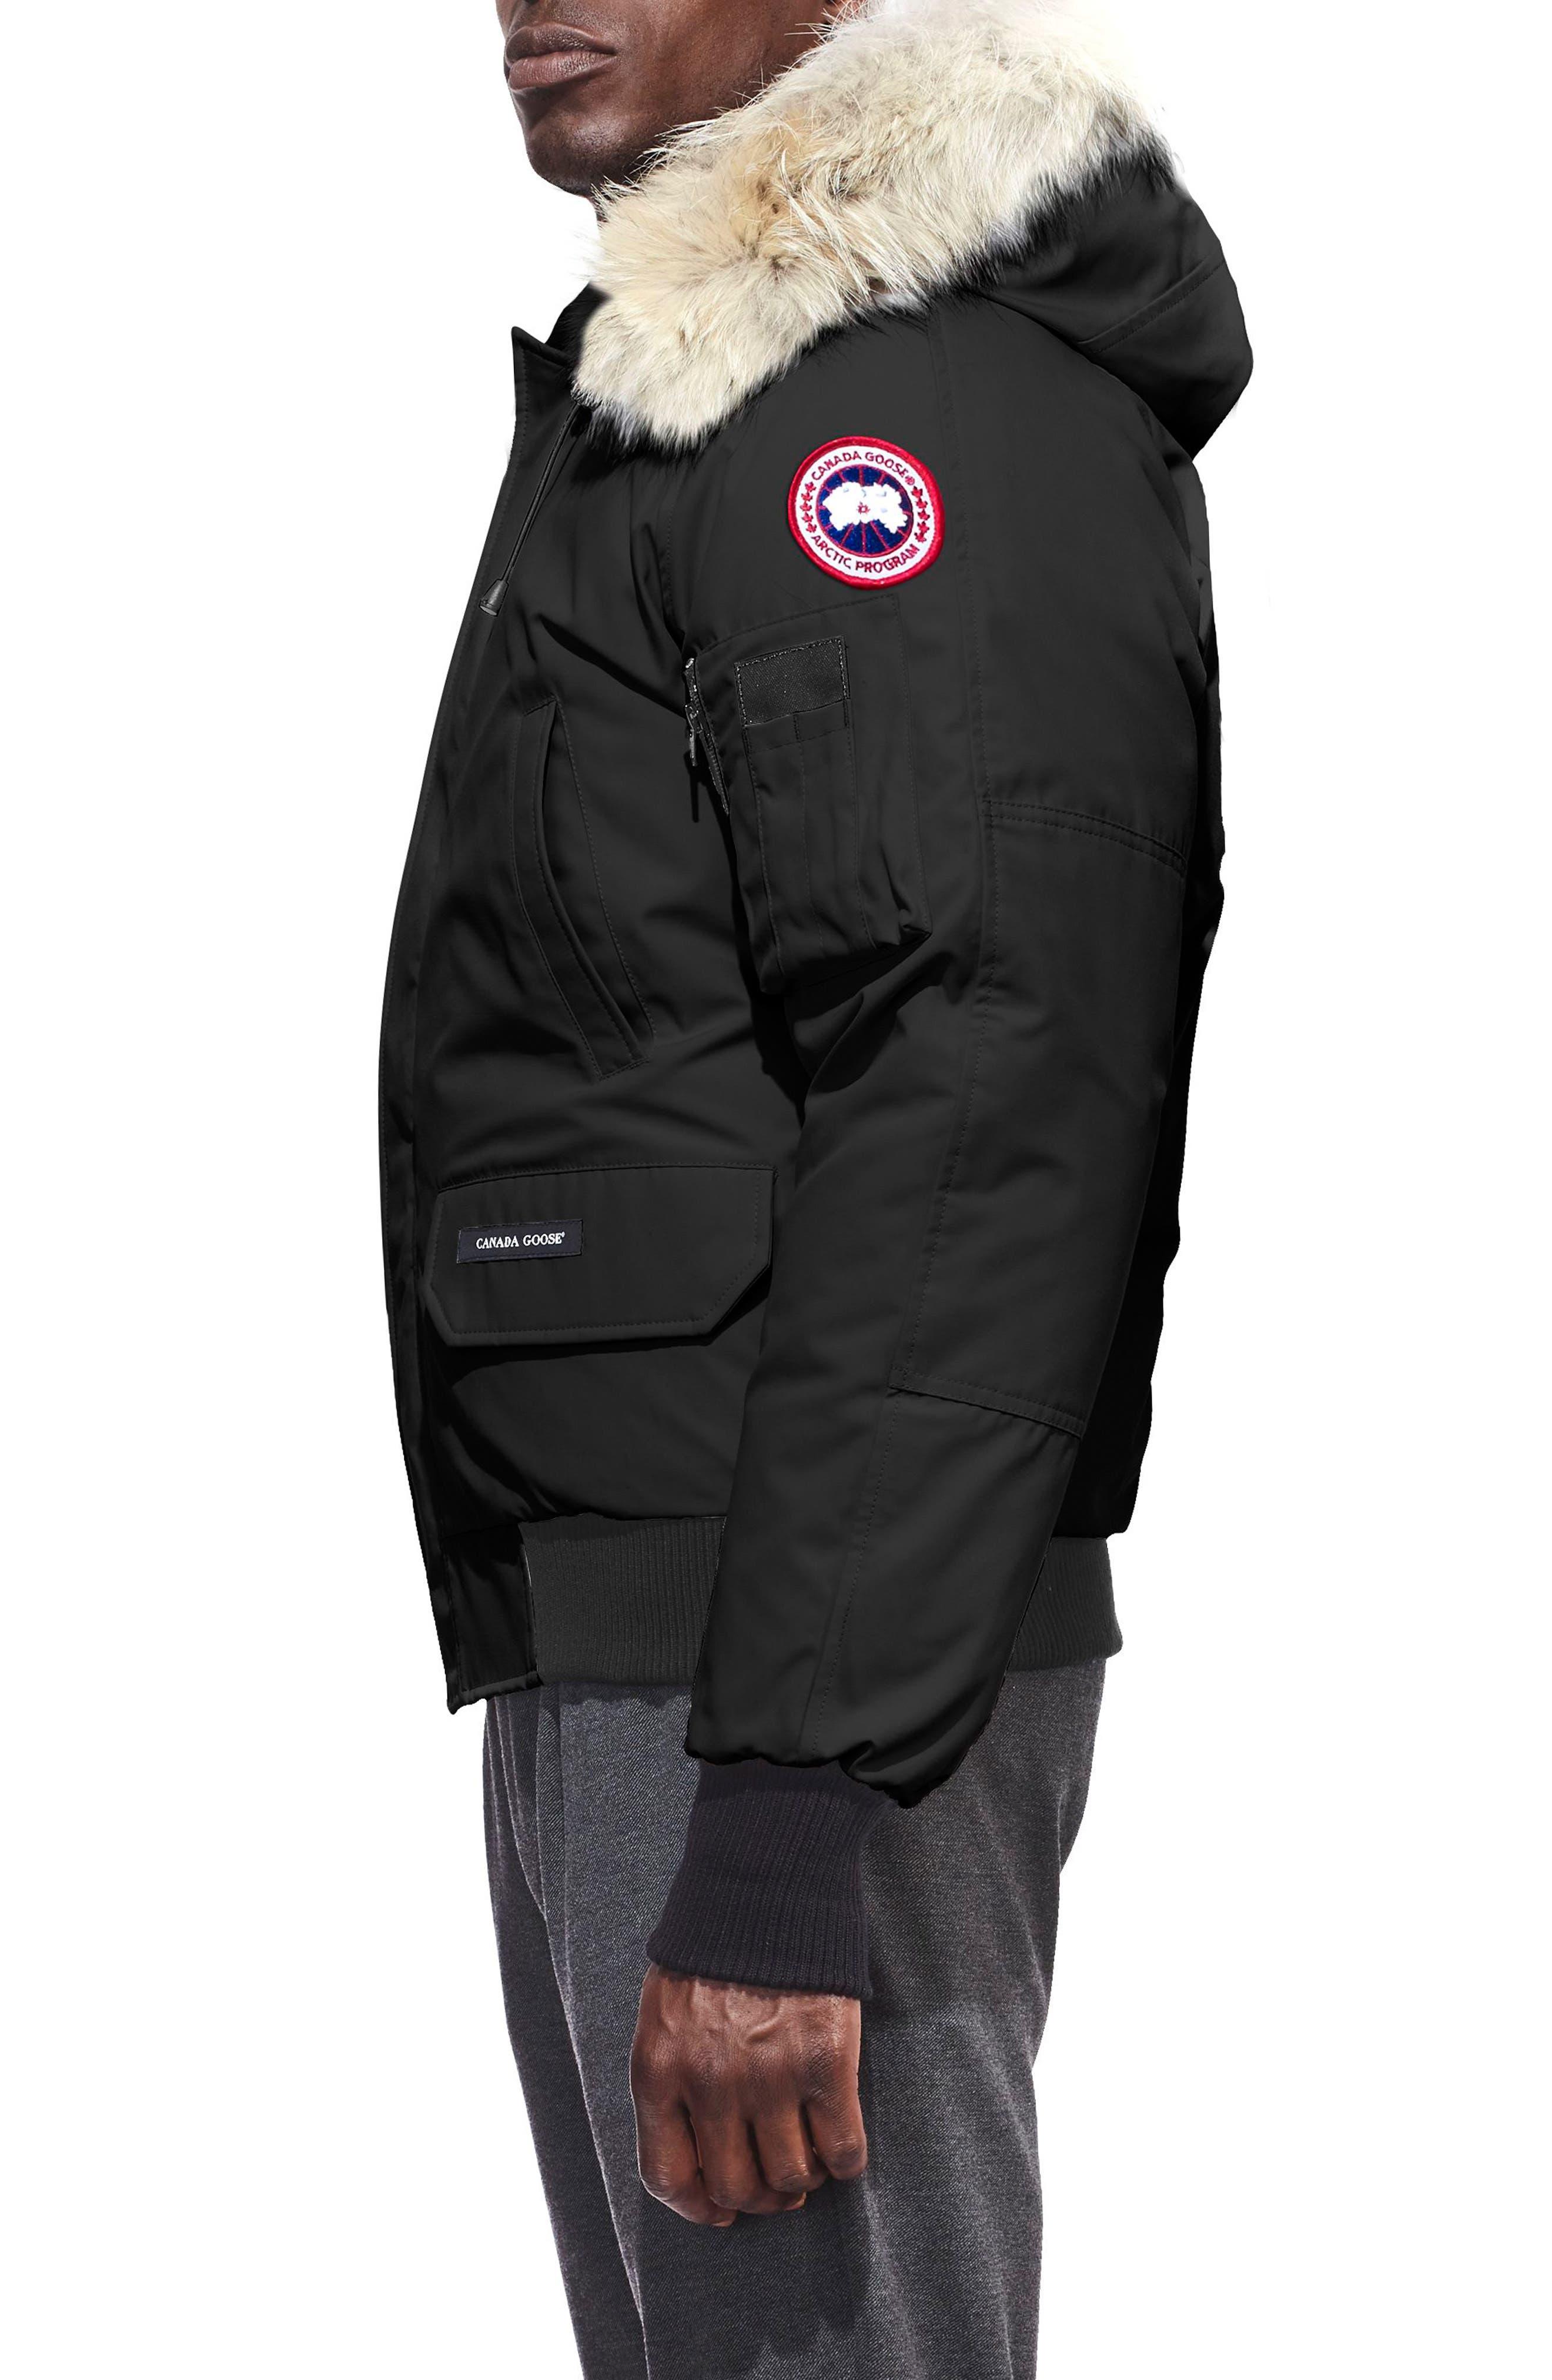 CANADA GOOSE, PBI Chilliwack Regular Fit Down Bomber Jacket with Genuine Coyote Trim, Alternate thumbnail 4, color, BLACK